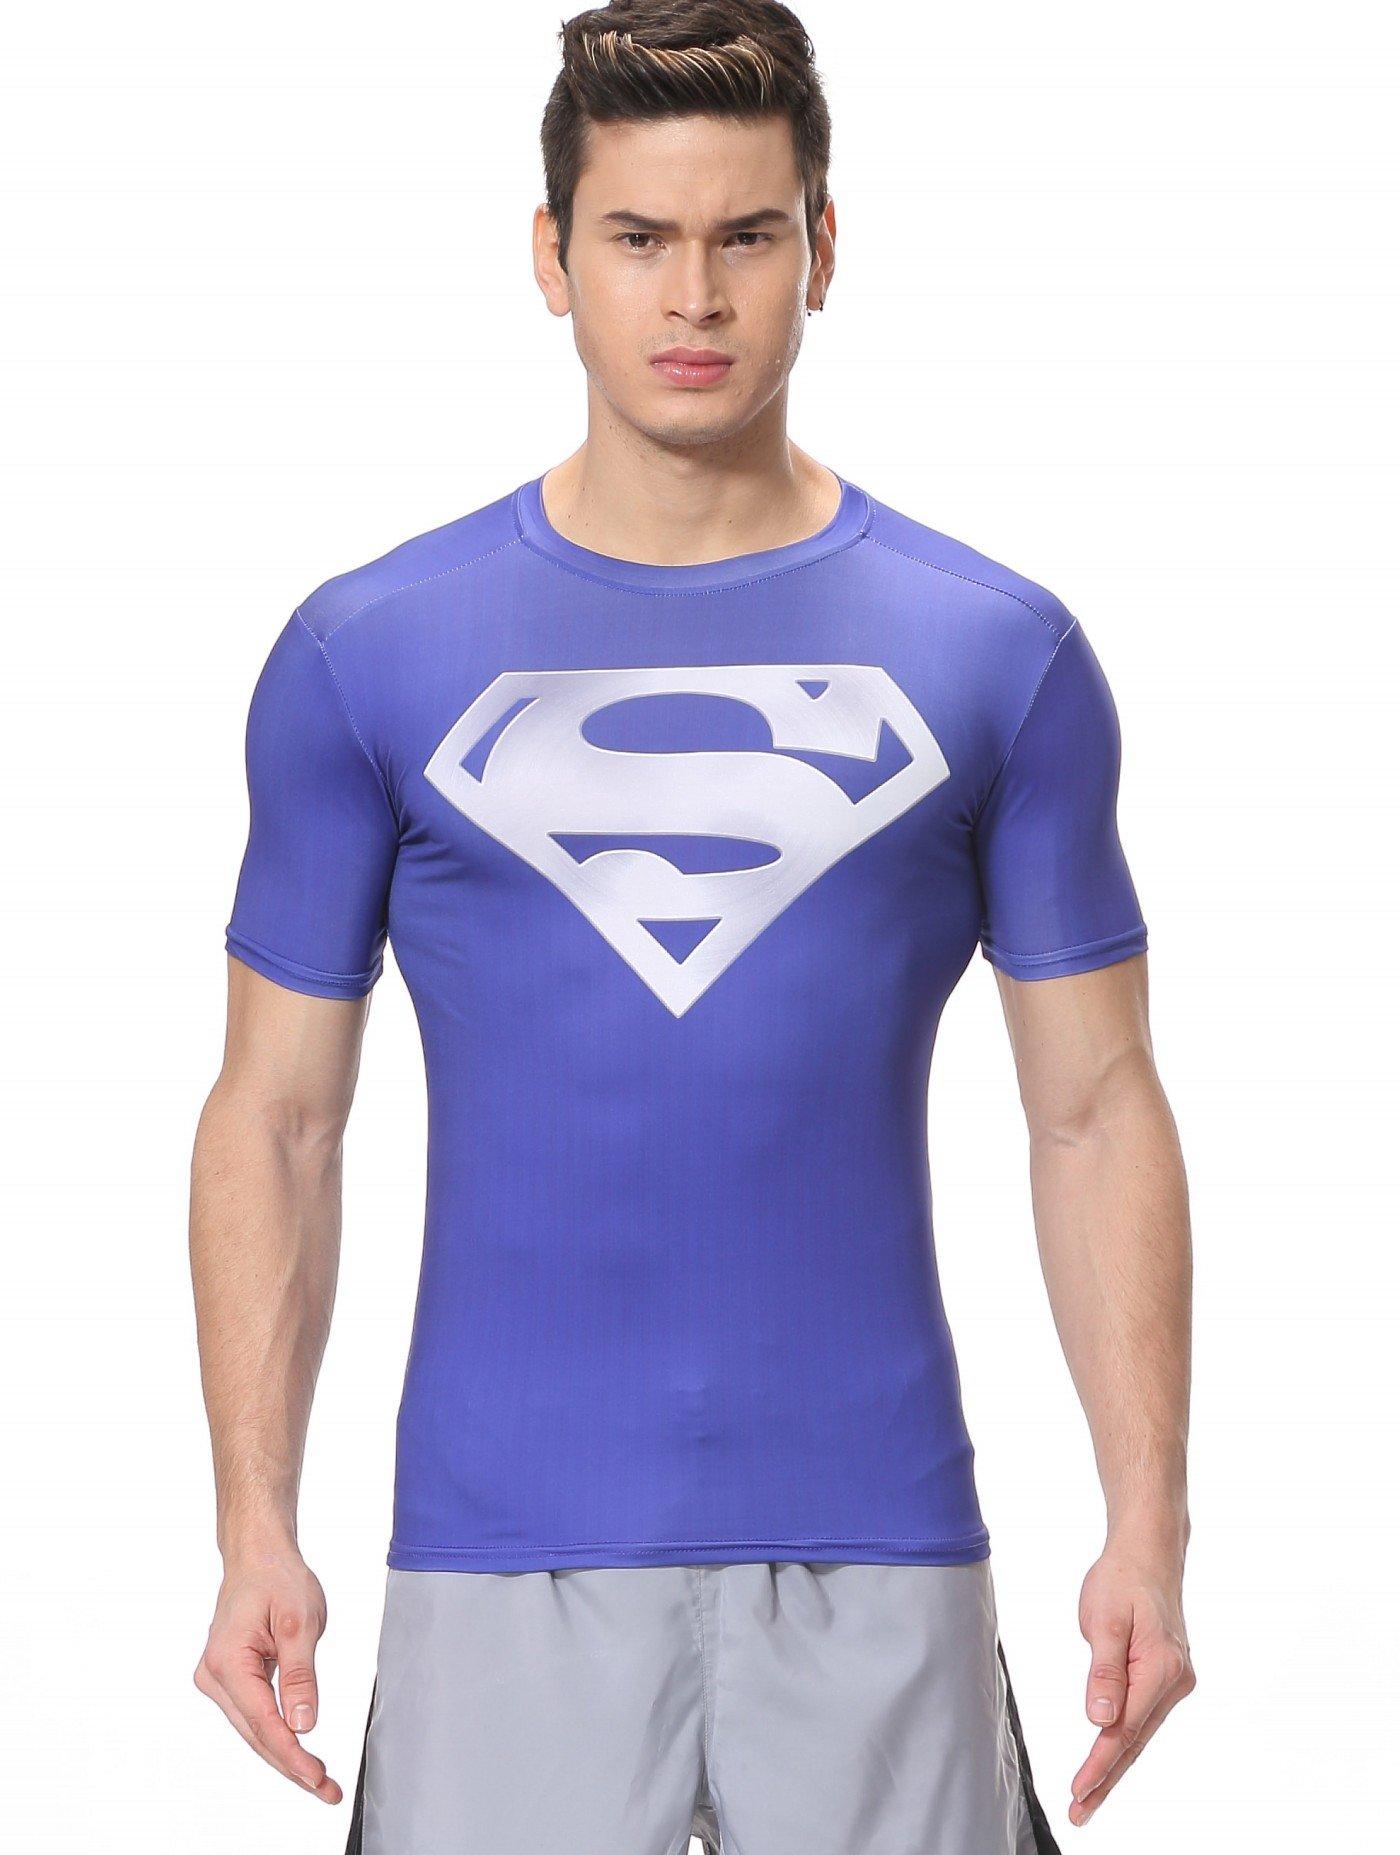 Red Plume Men's Compression Sport Fitness Gym Shirt,Short Sleeve S Logo T-Shirt